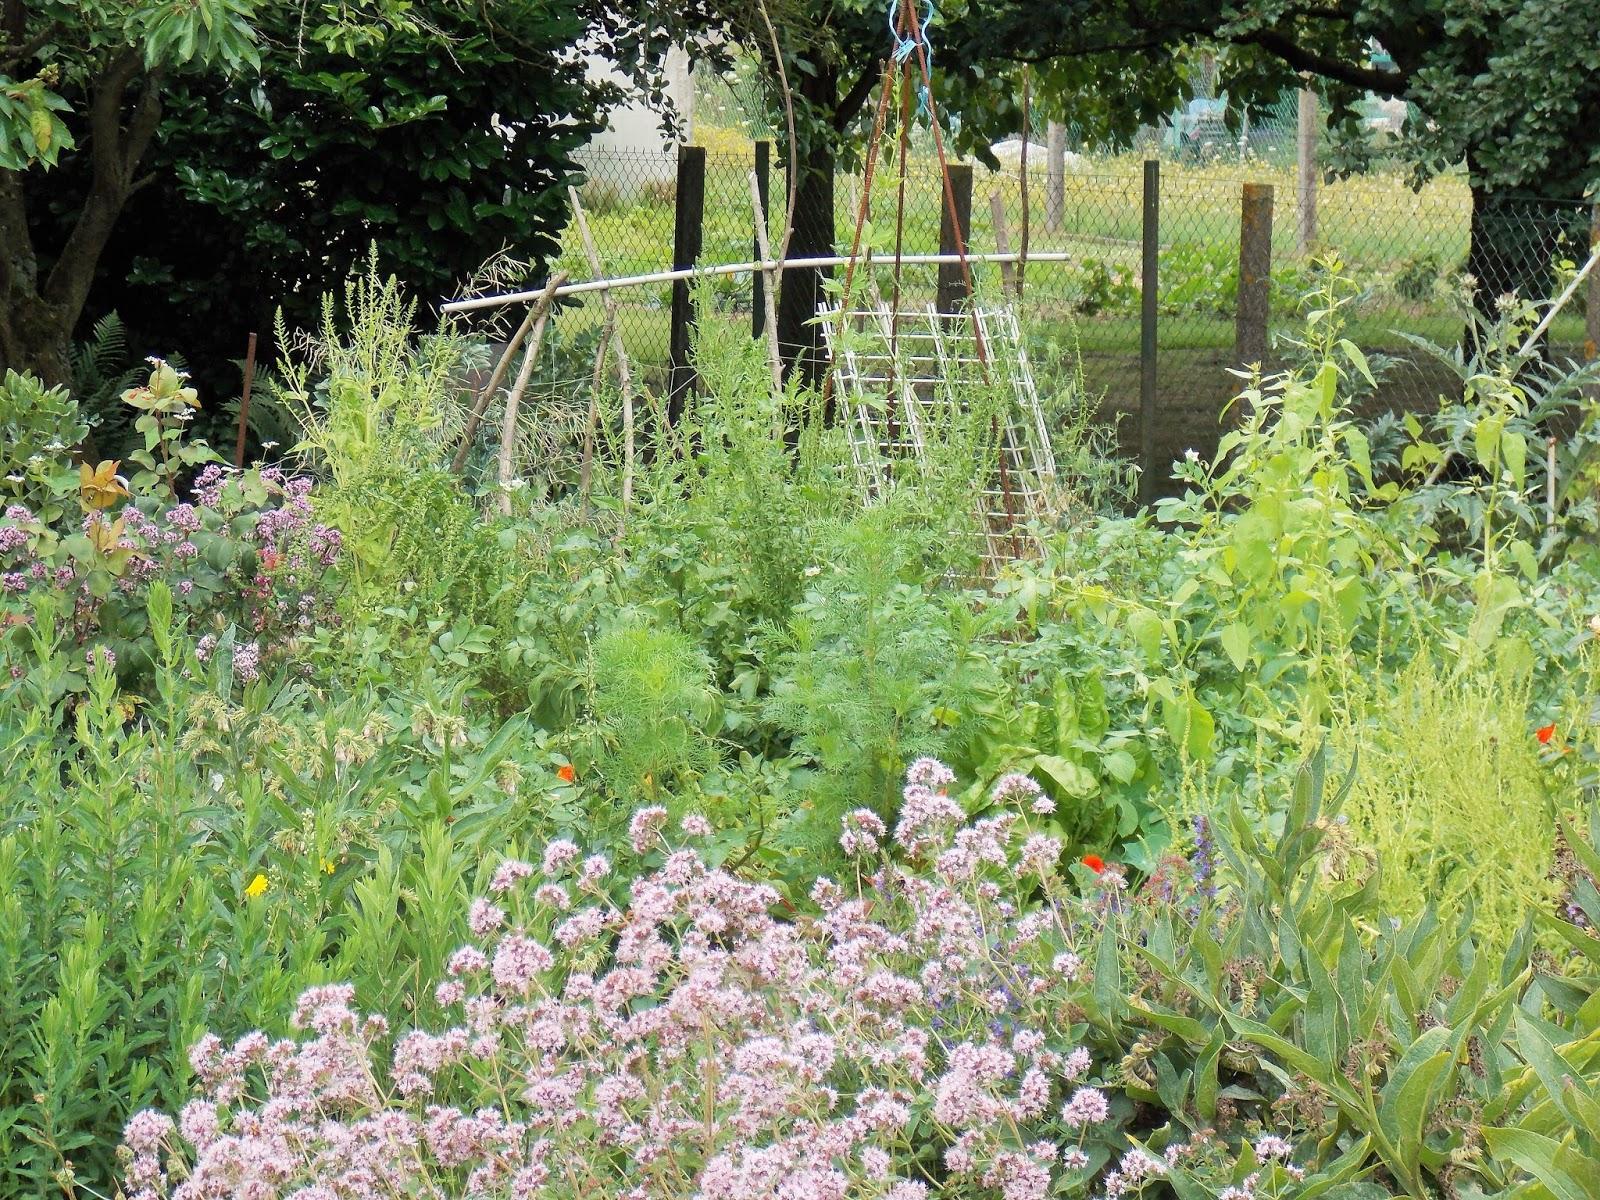 Ecolo bio nature permaculture urbaine et jardinage bio for Jardin bio 2015